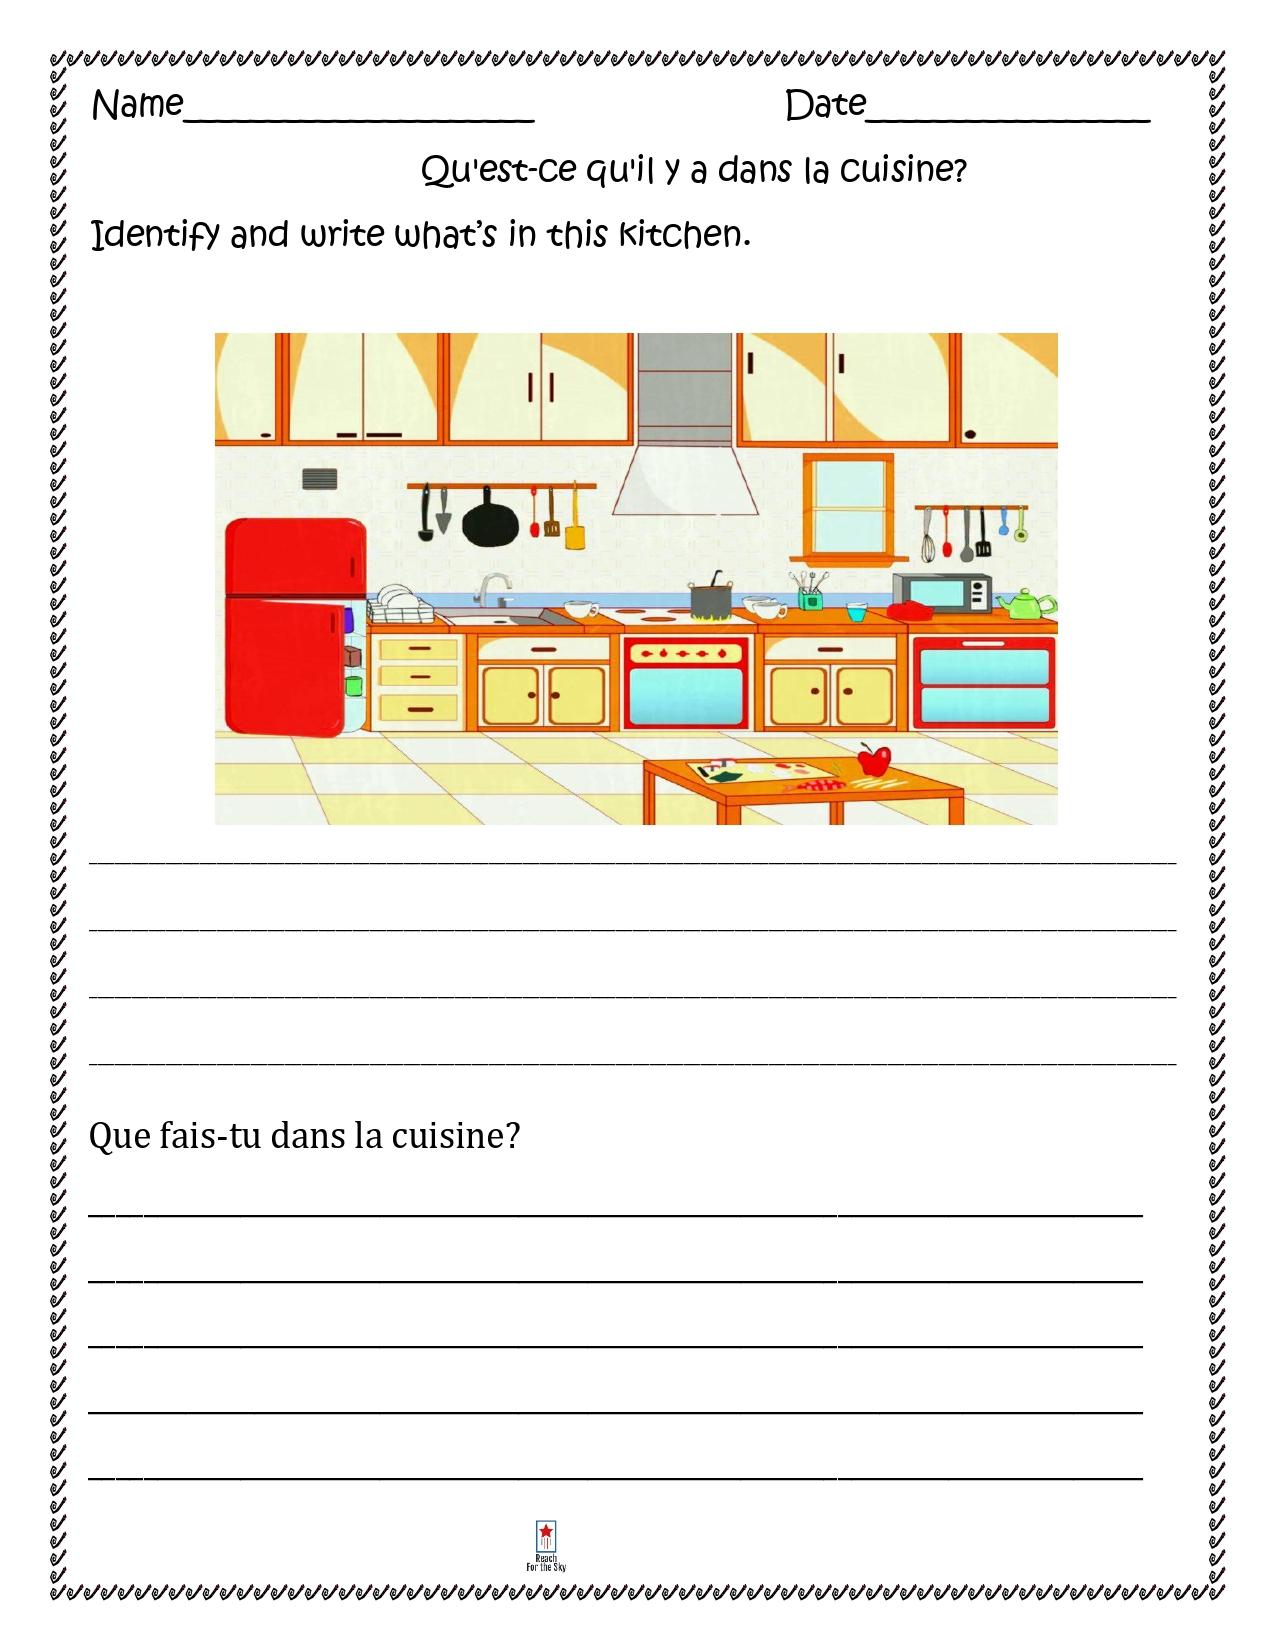 Dans La Cuisine French Kitchen Distance Learning